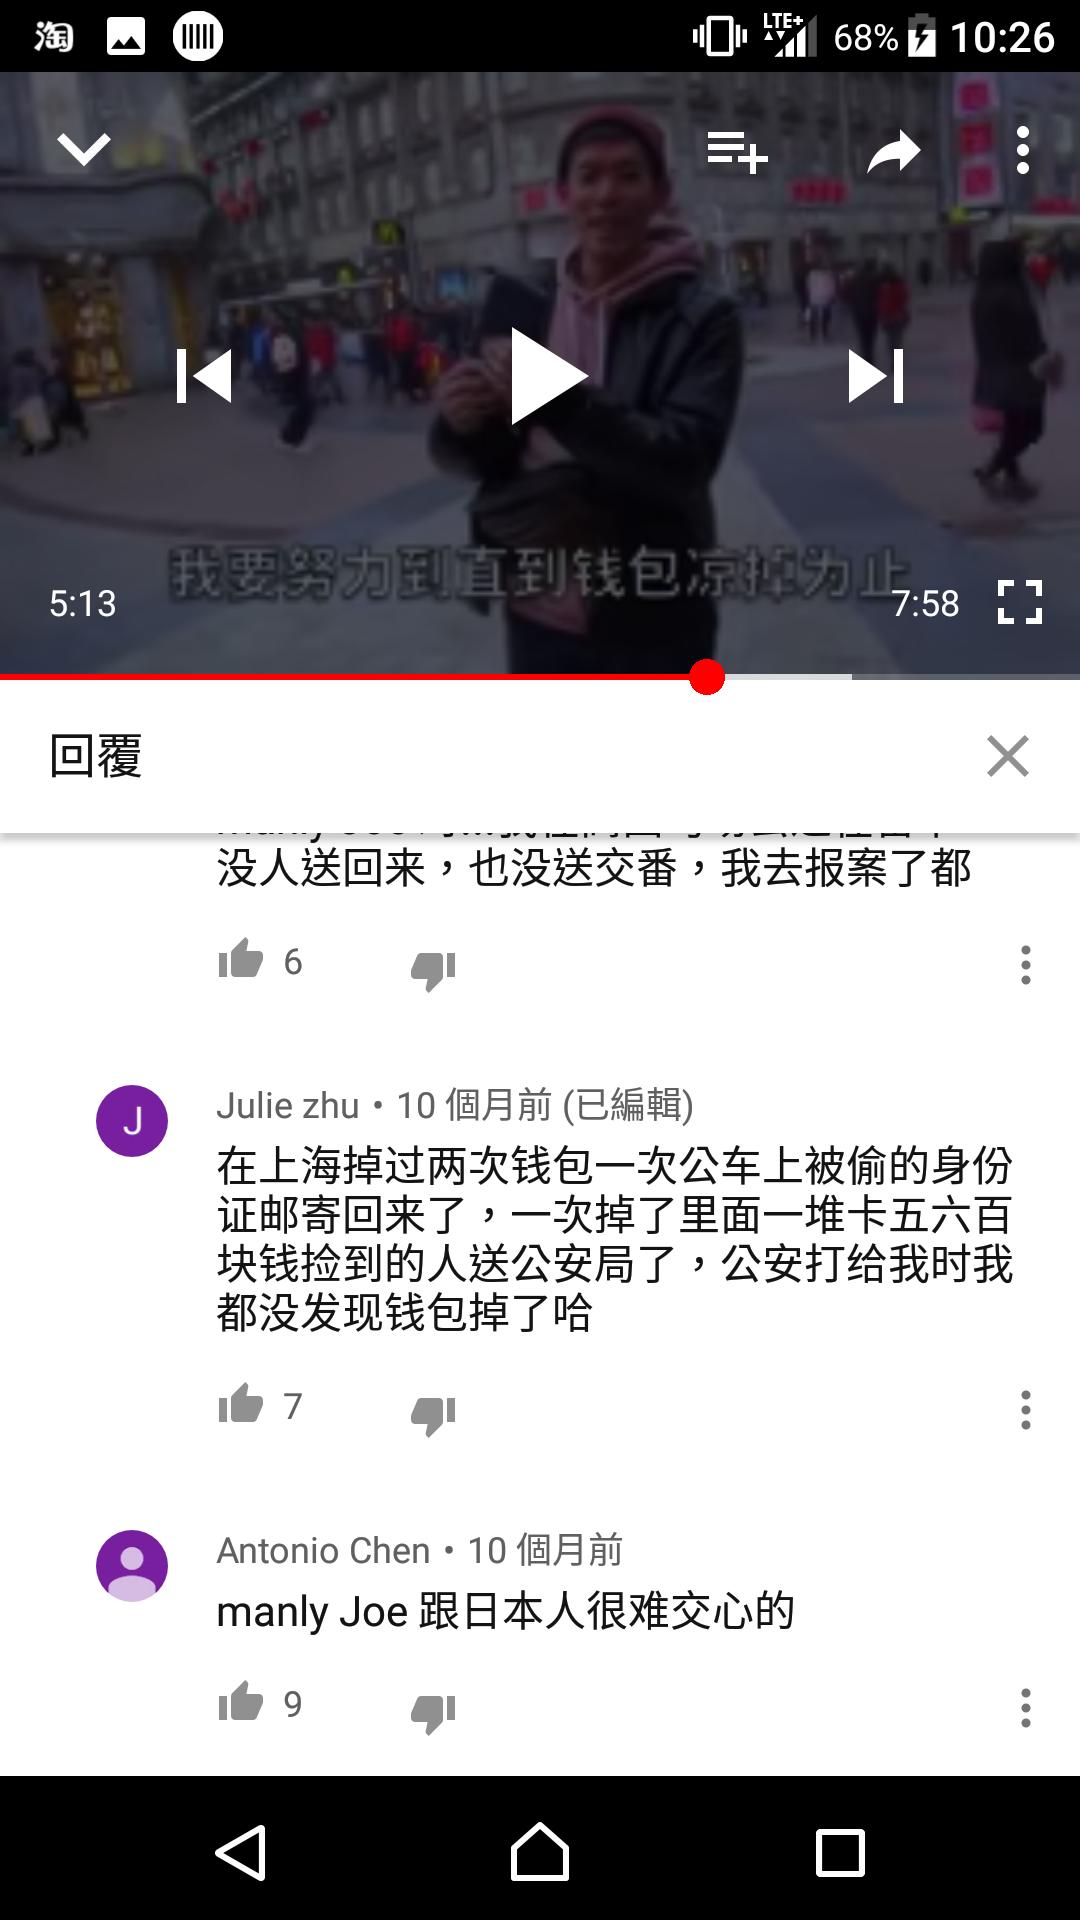 [img]https://upload.cc/i1/2018/12/28/g3vAlL.png[/img]